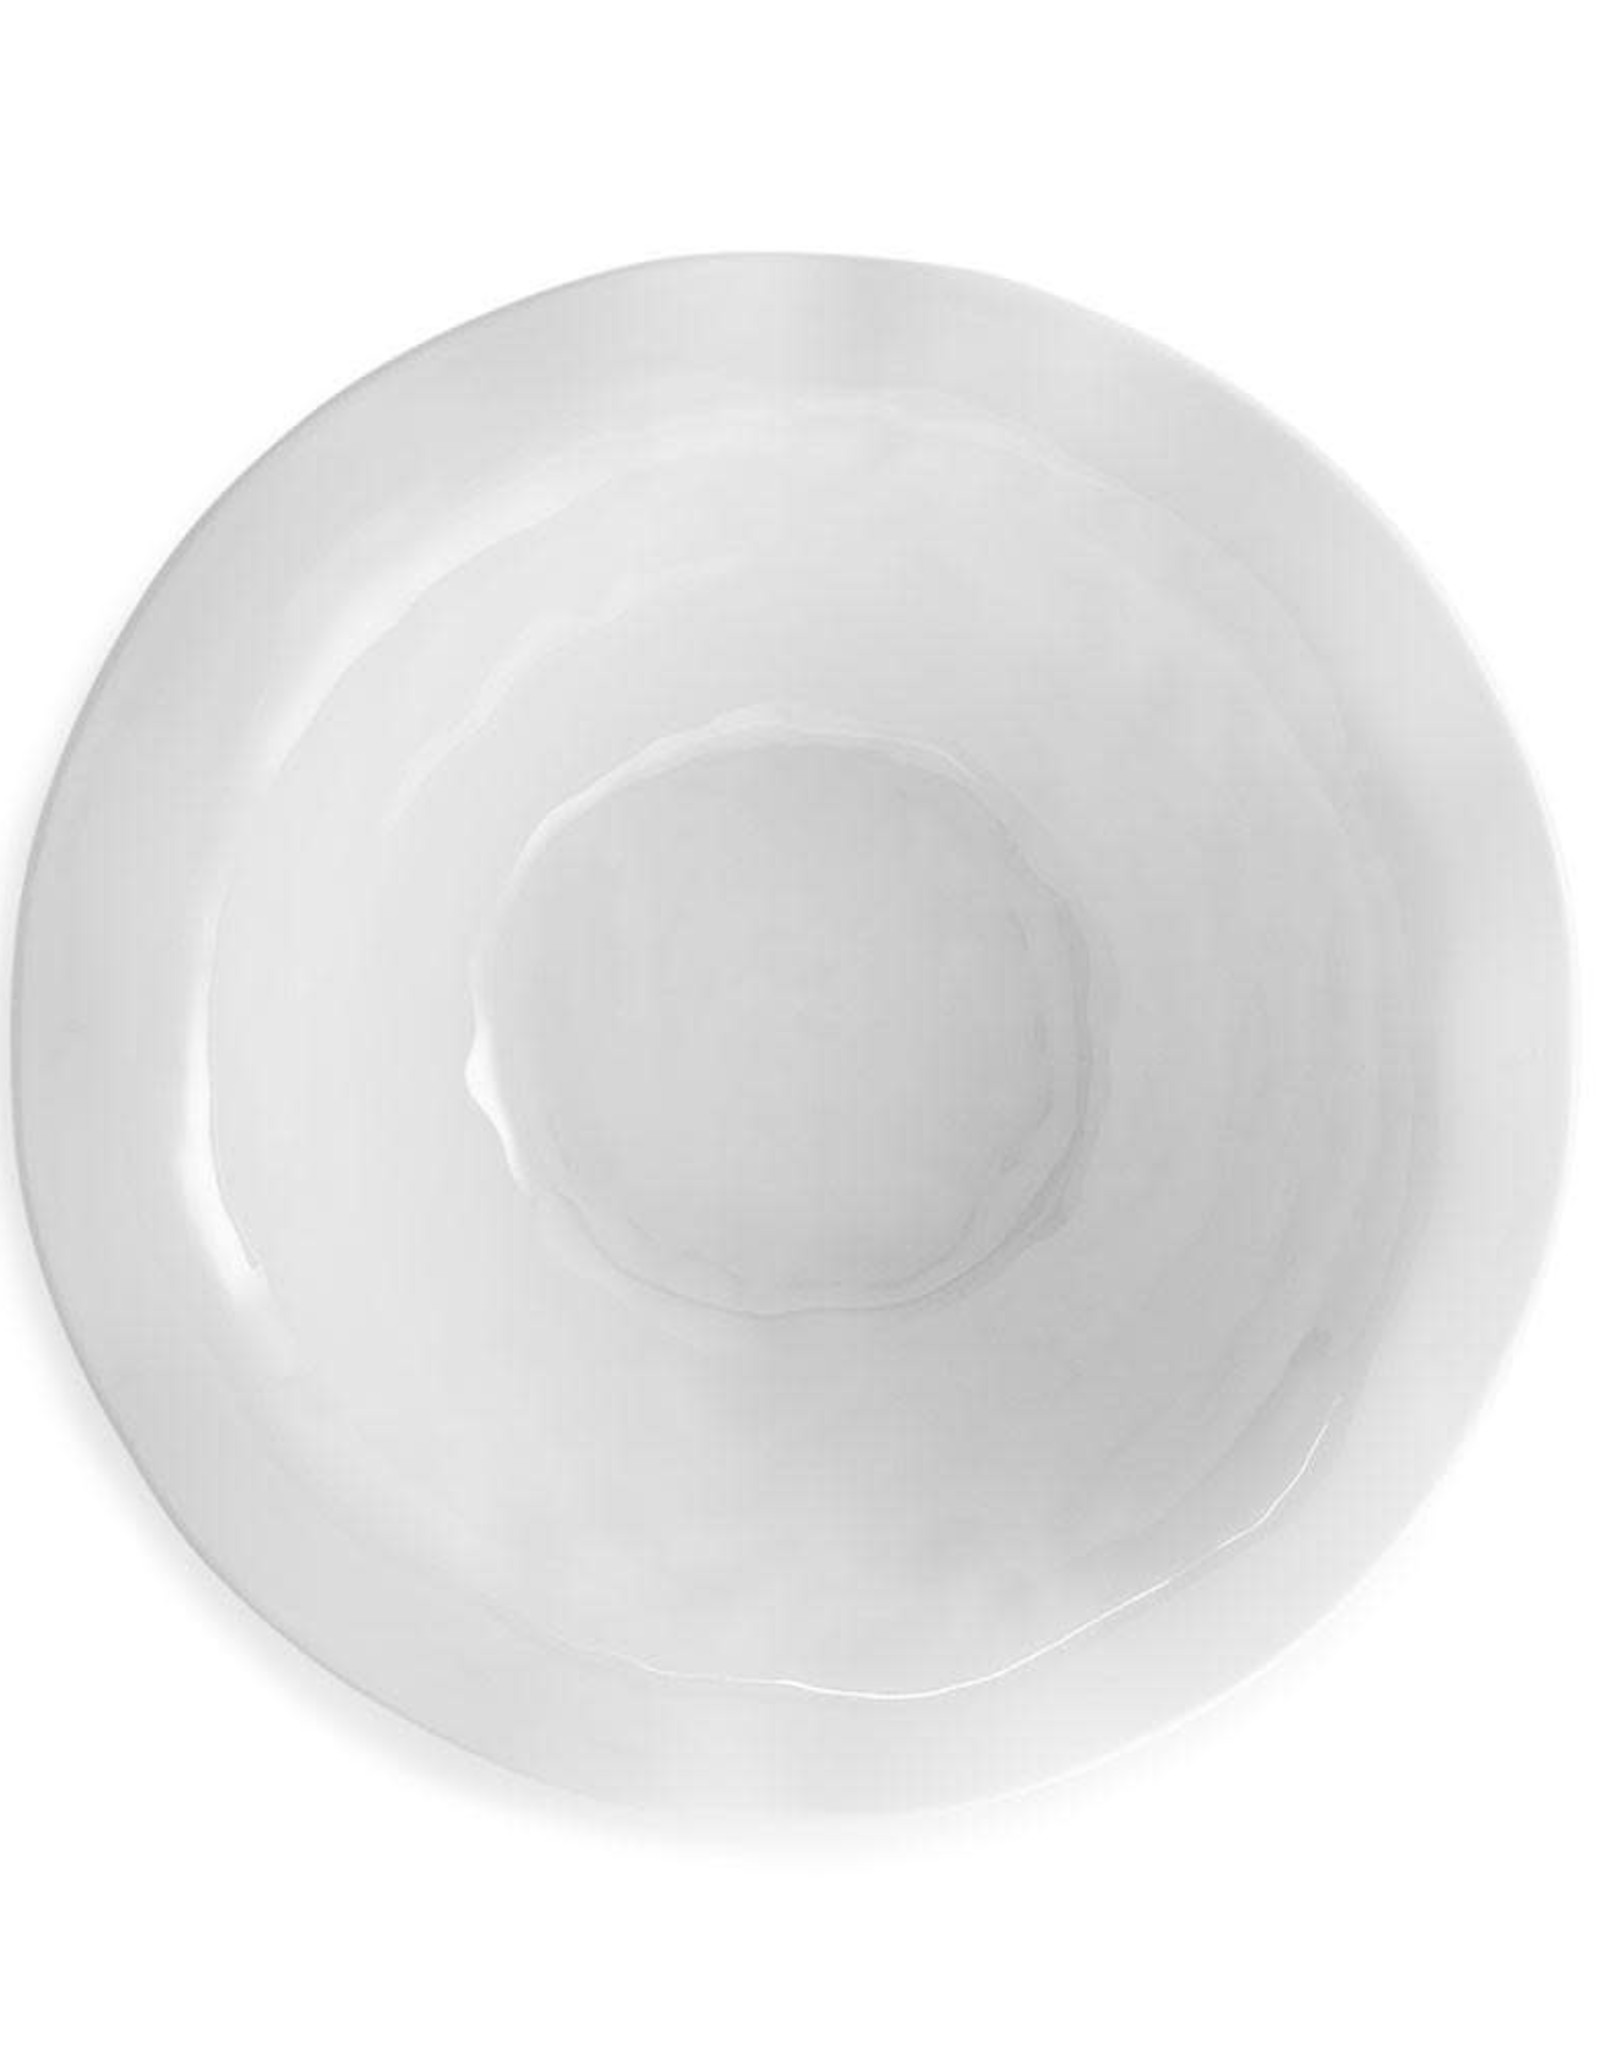 QSQUARED Round Serving Bowl